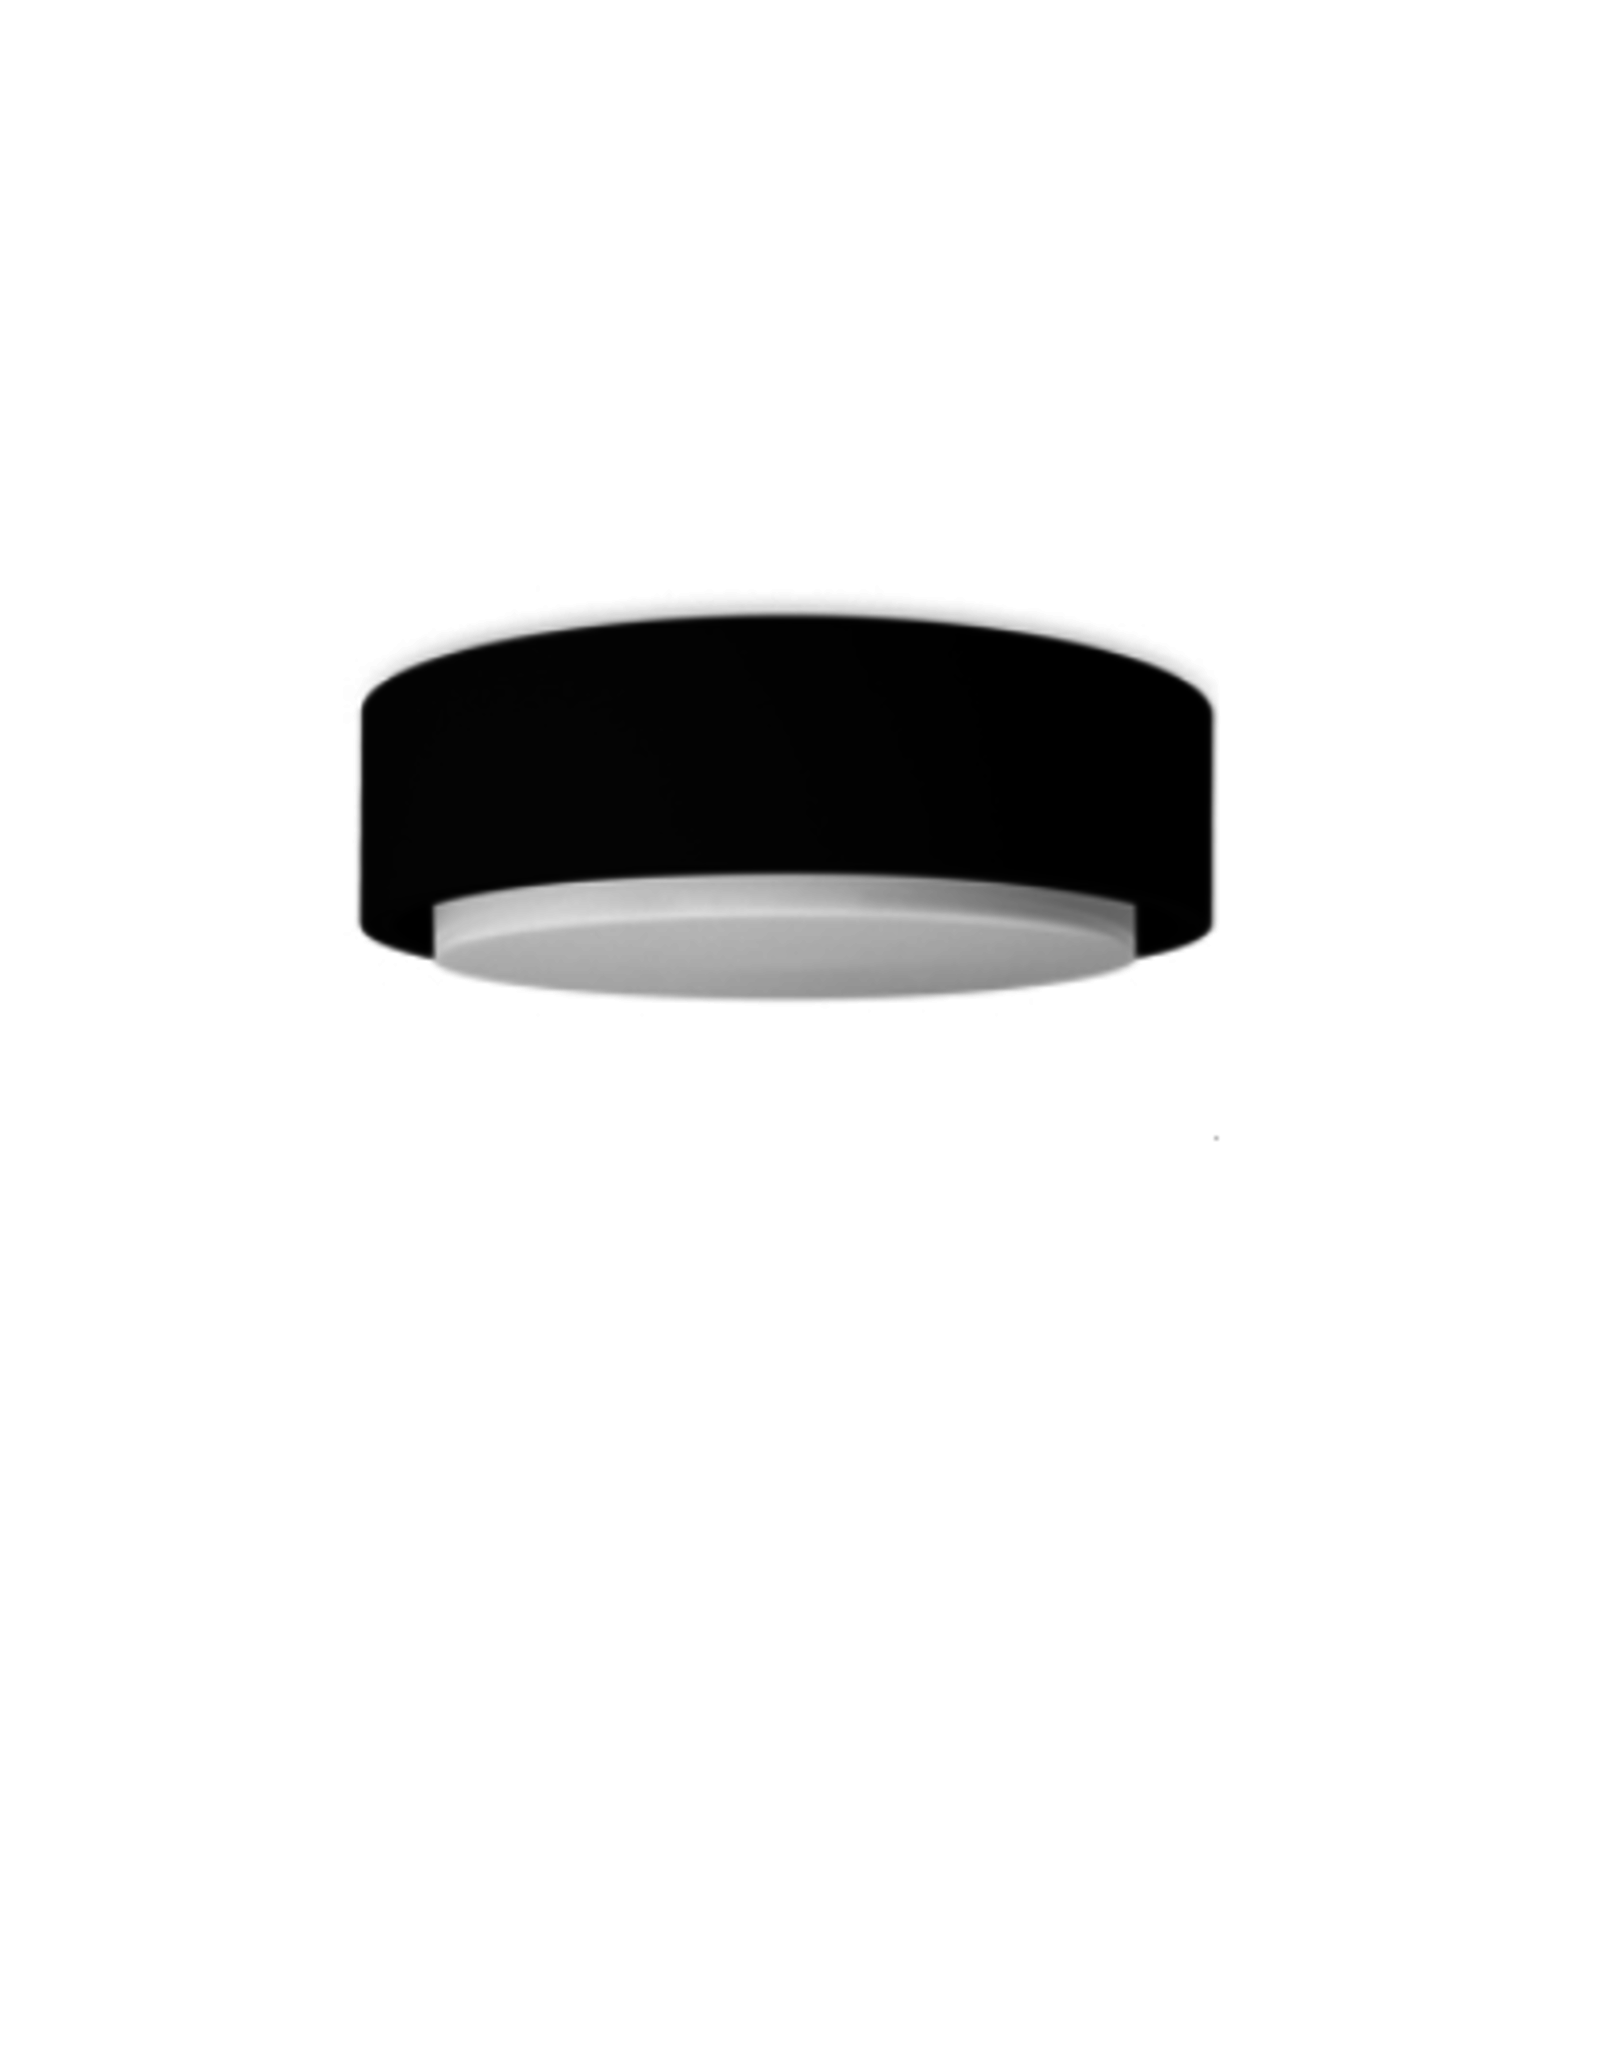 LED plafonniere multi+ nood 30PC - 3000k - 9,5W